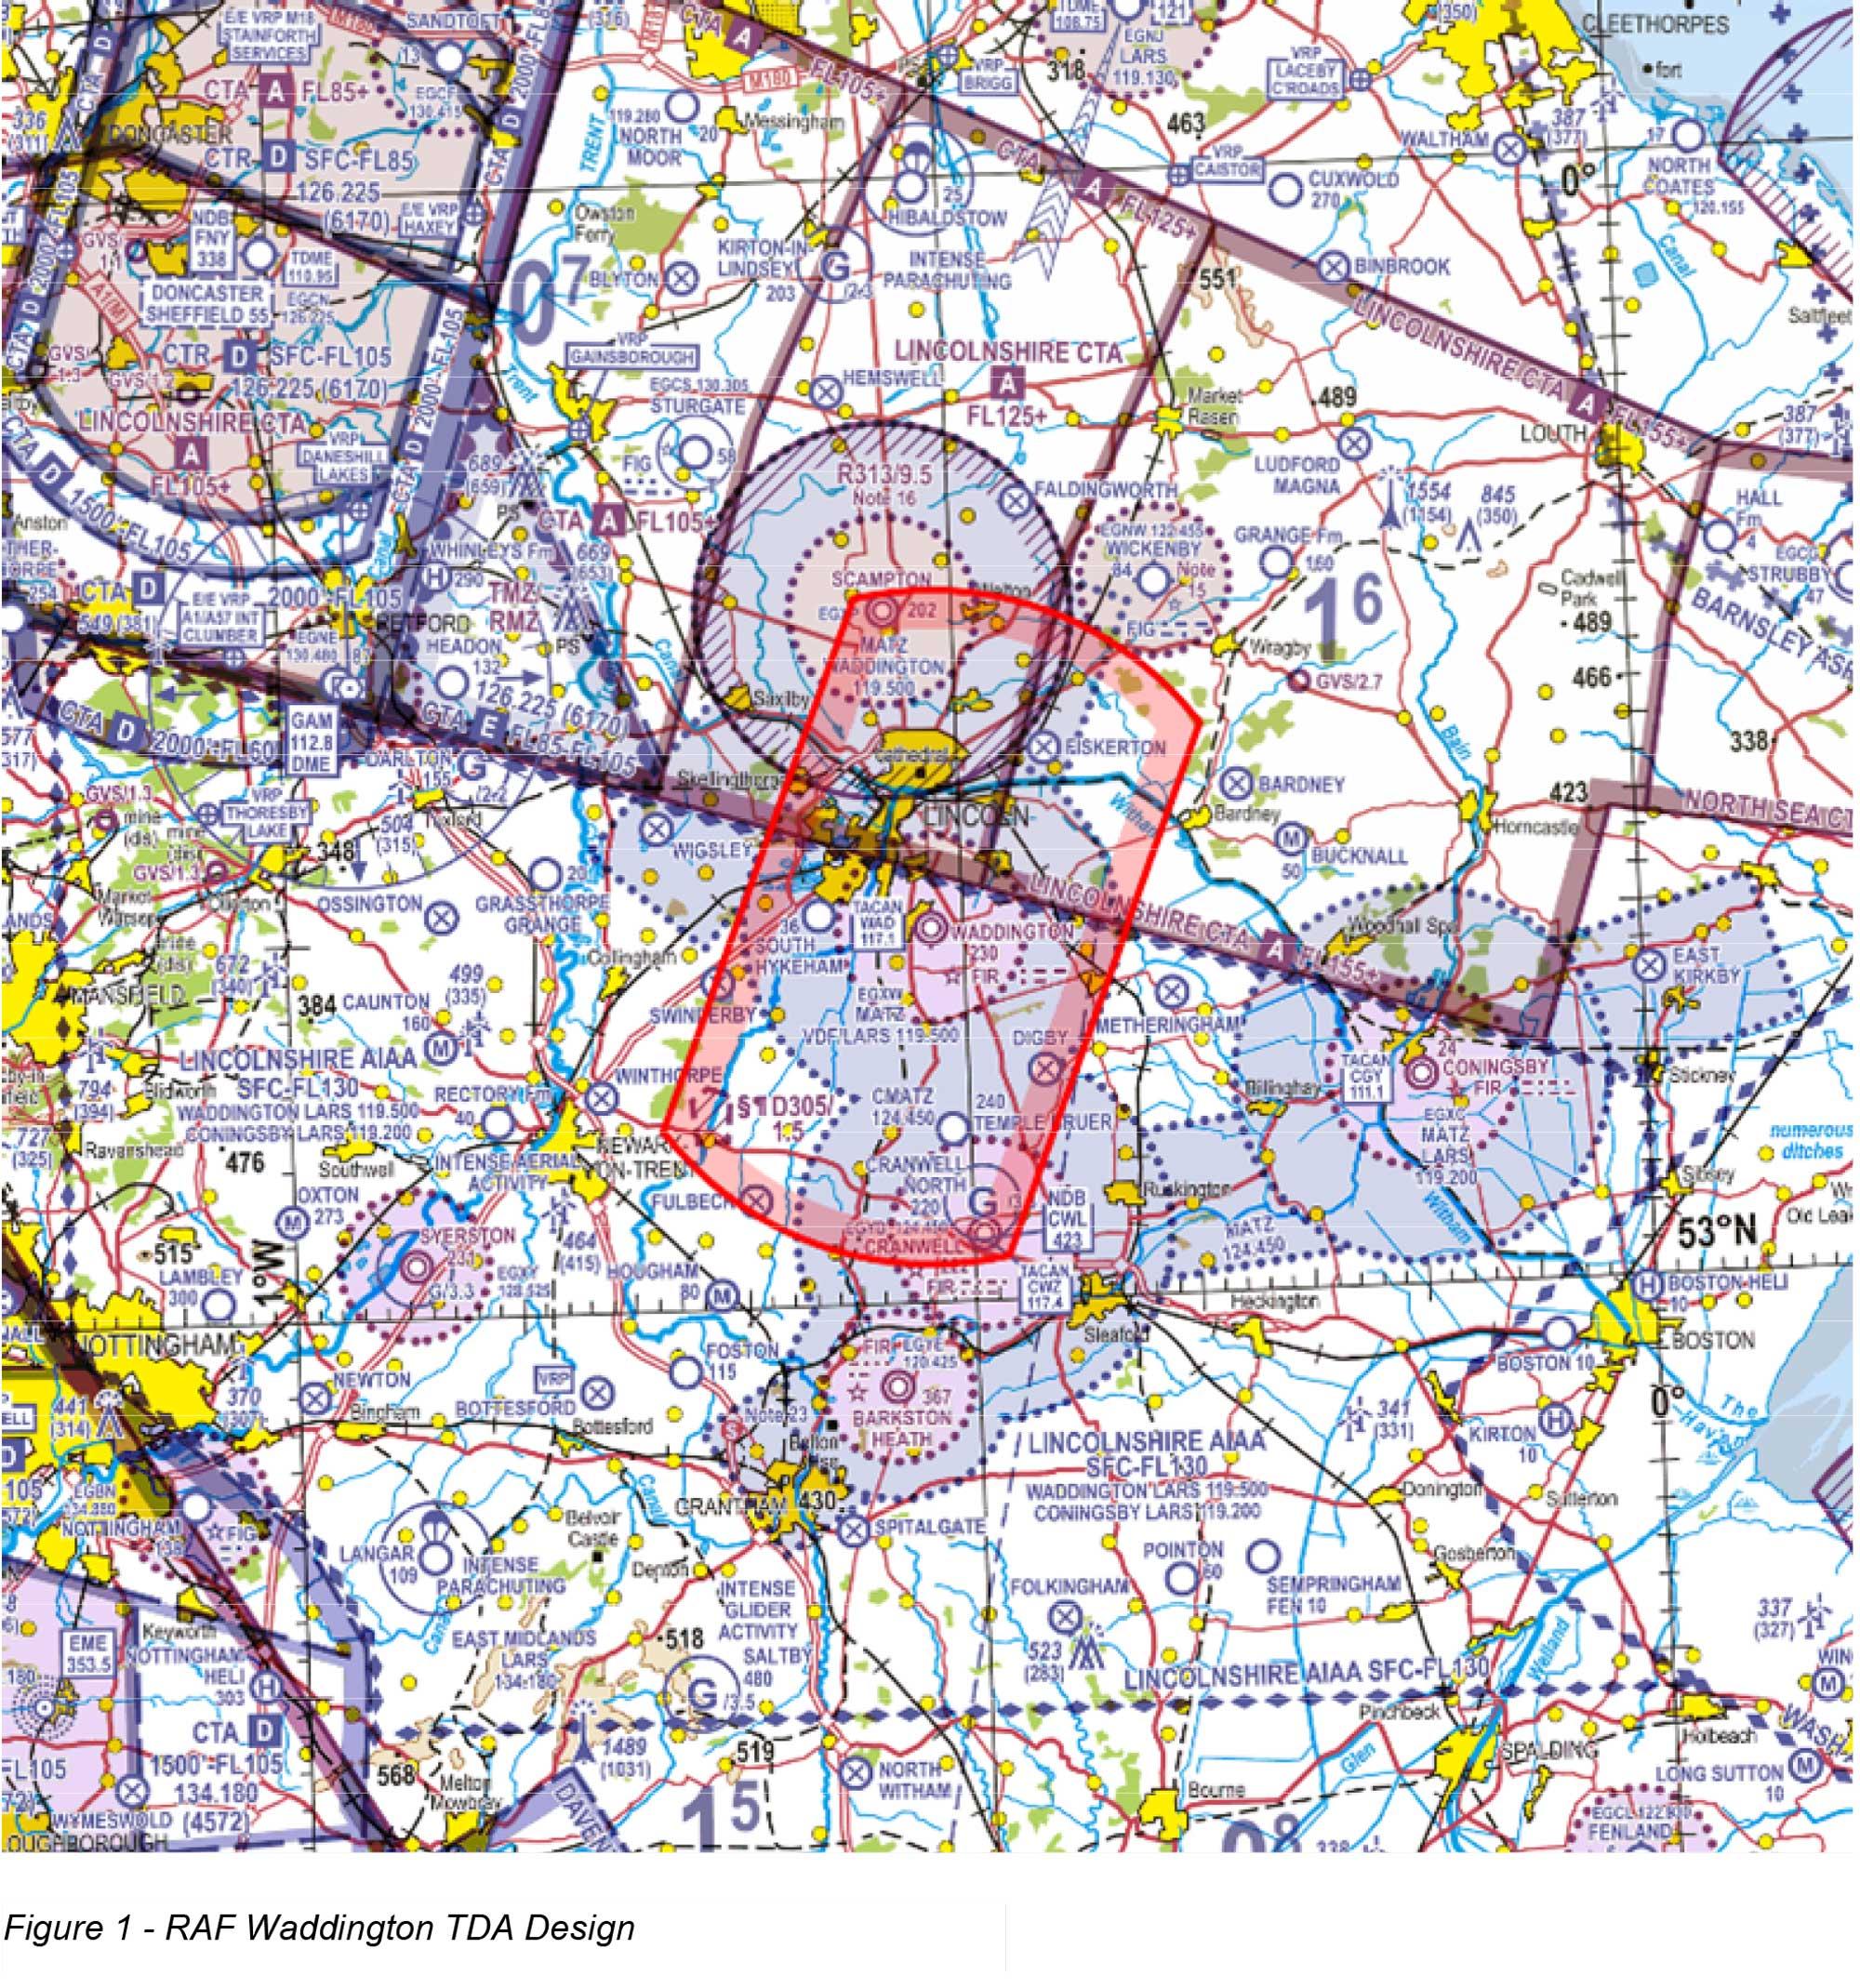 RAF Waddington TDA